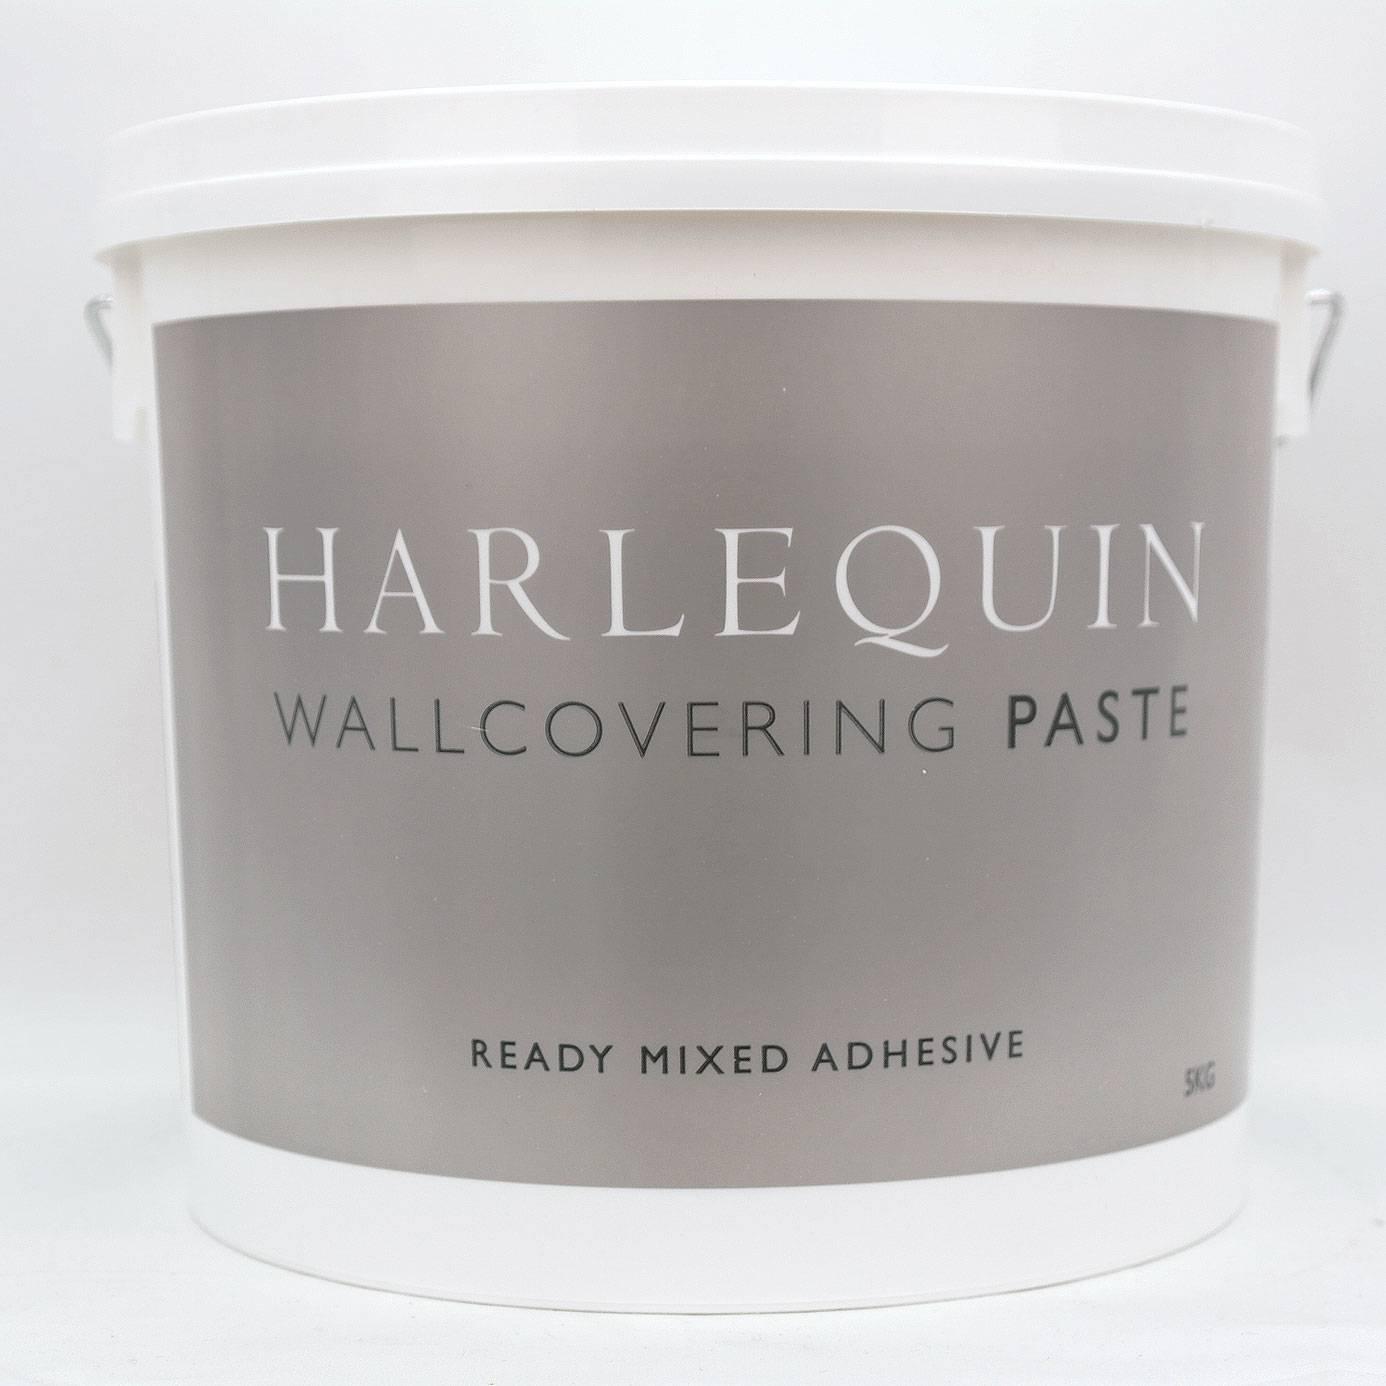 Harlequin Wallpaper Paste